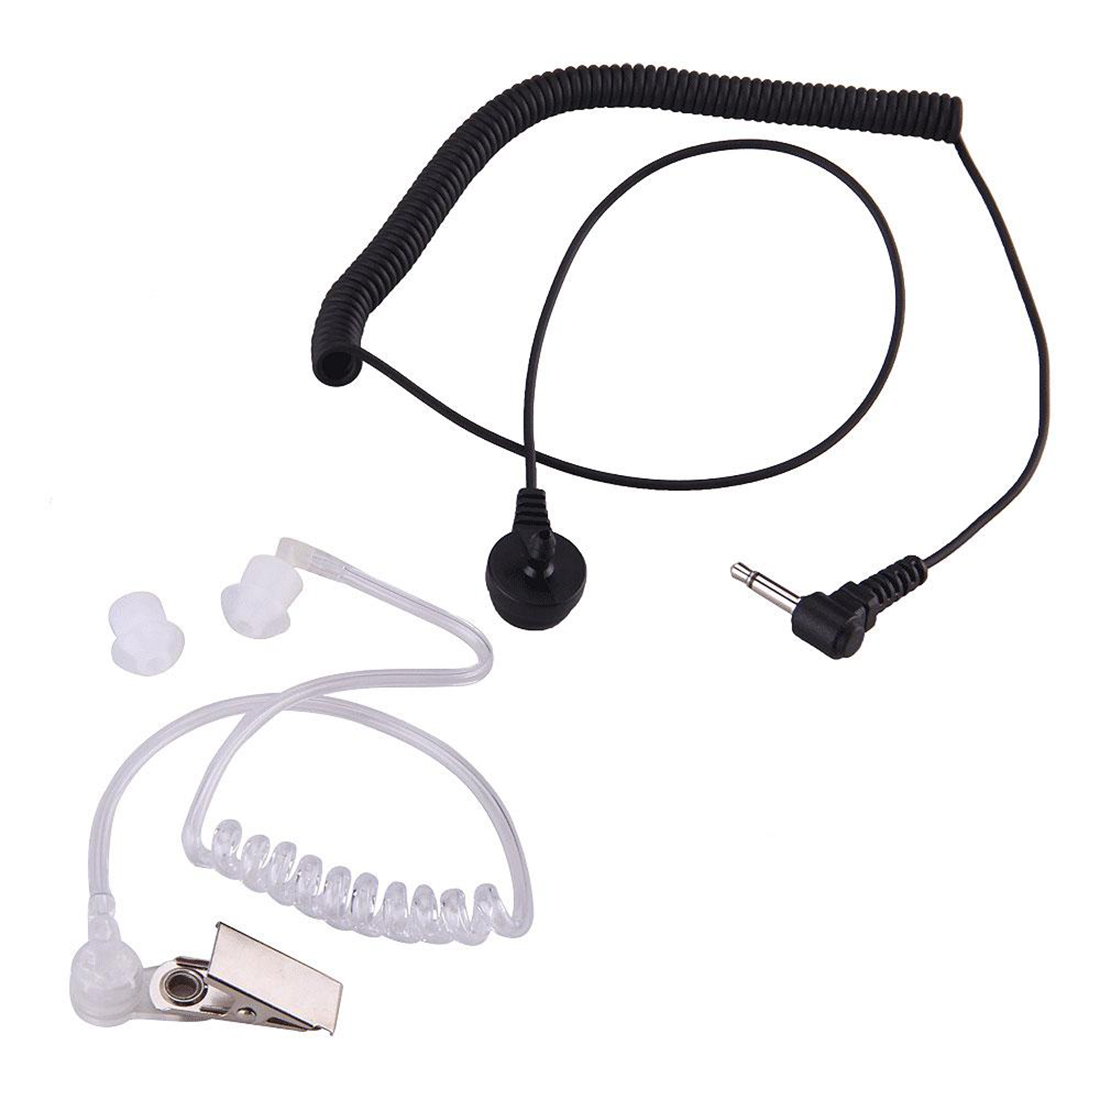 Etmakit 2017 New Fashion 3.5mm Covert Mic Acoustic Tube Earpiece Earphone Headset 1 PIN For Motorola ICOM Radio